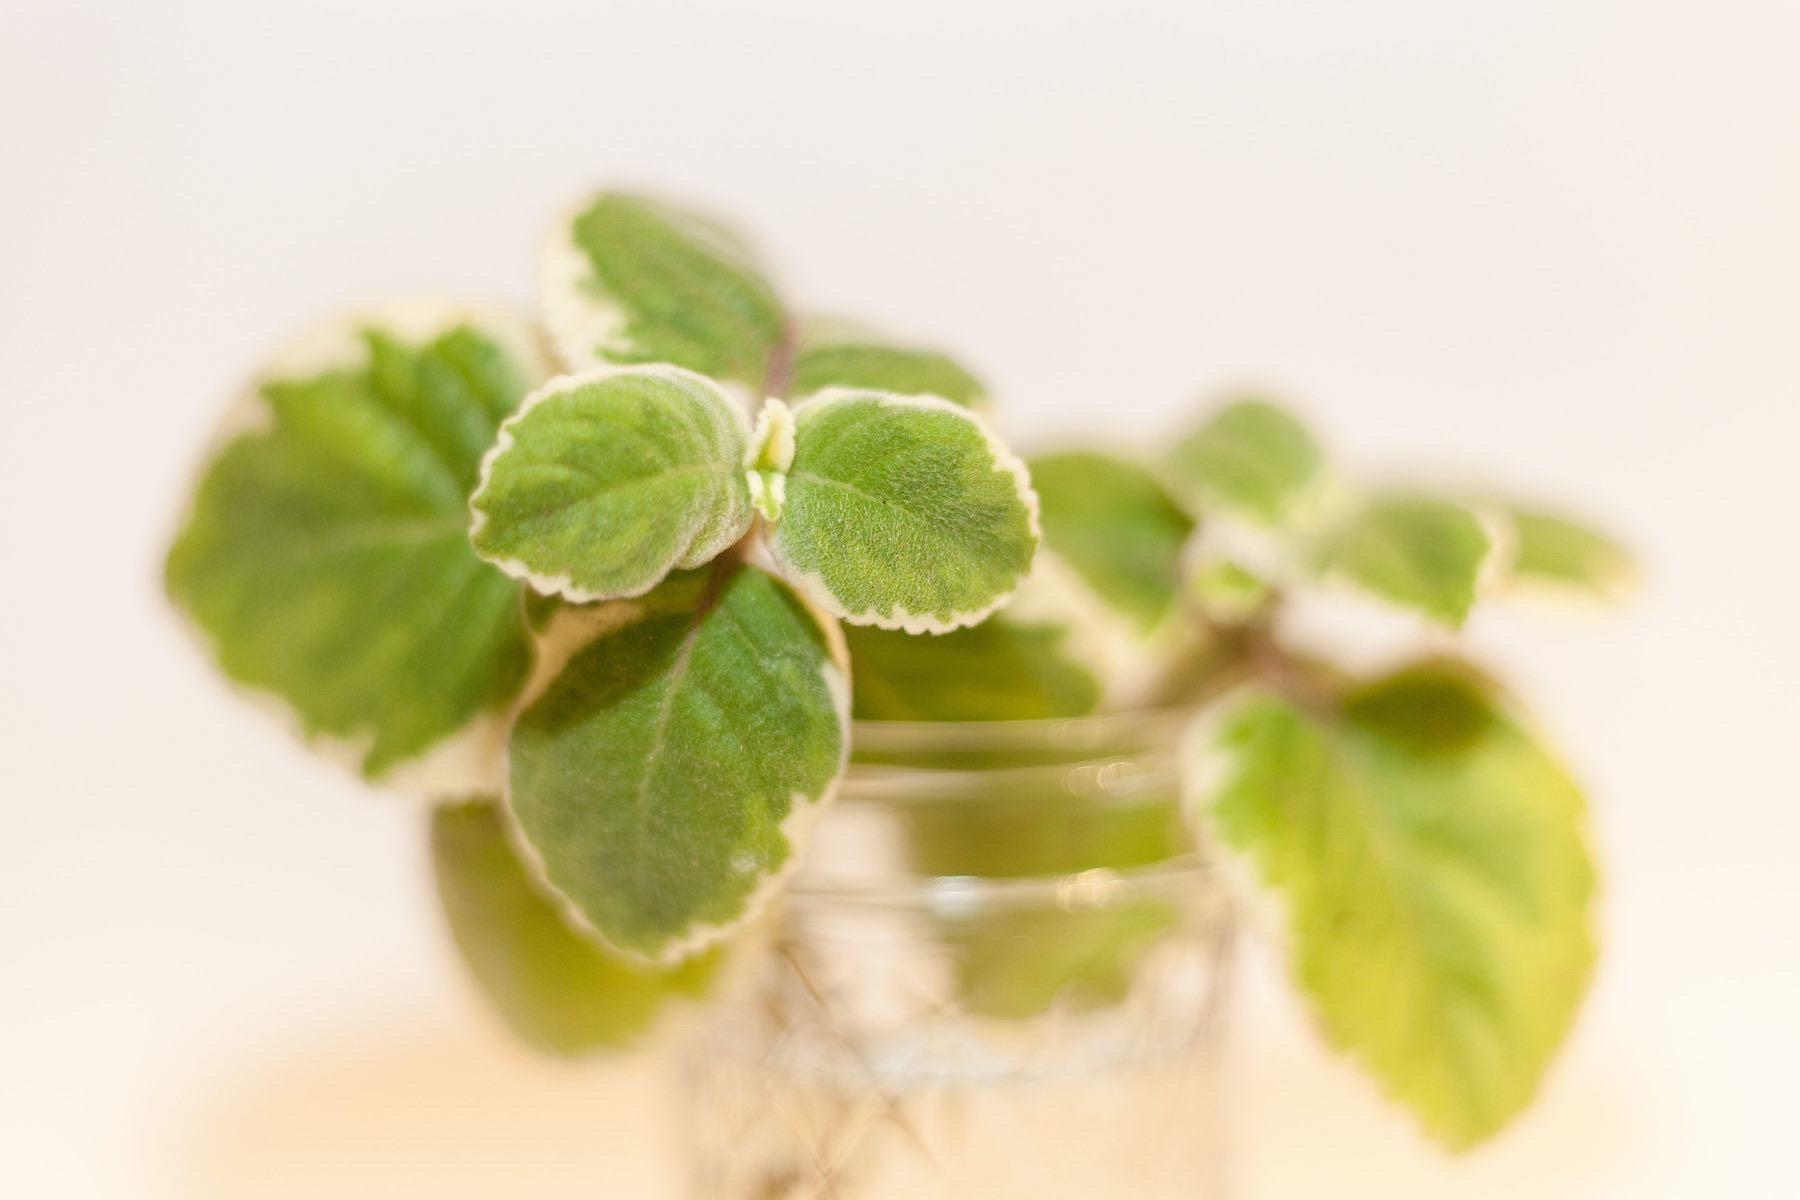 Plants in glass mason jar.